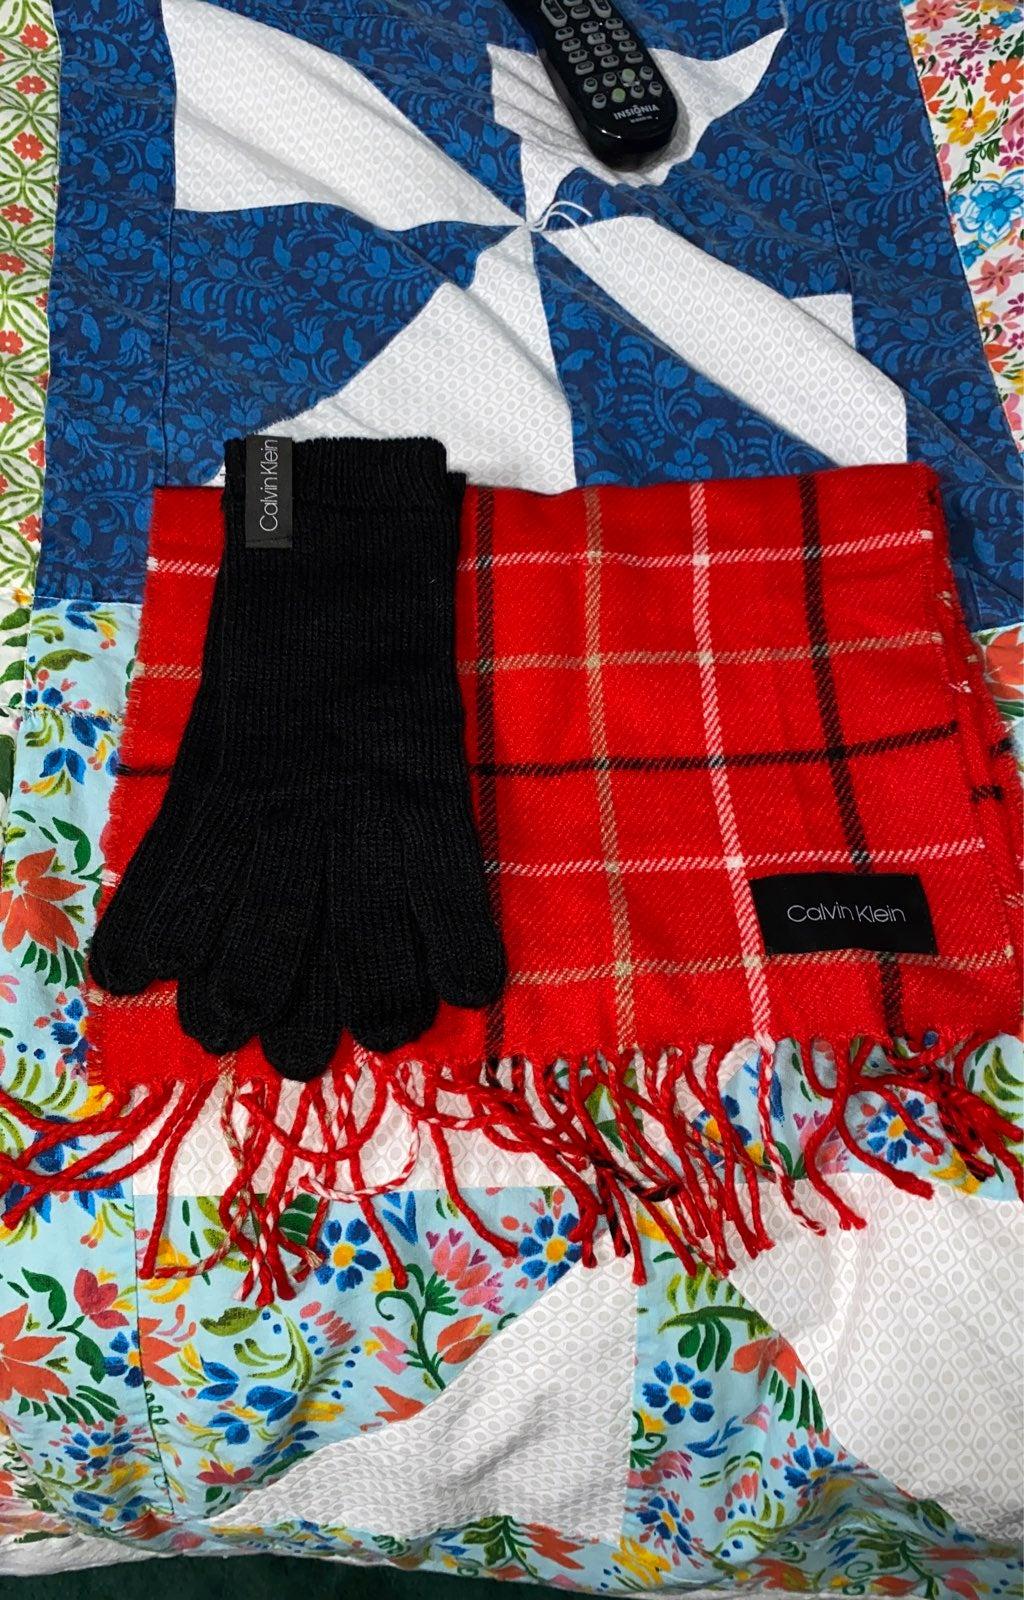 Calvin Klein gloves and scarf